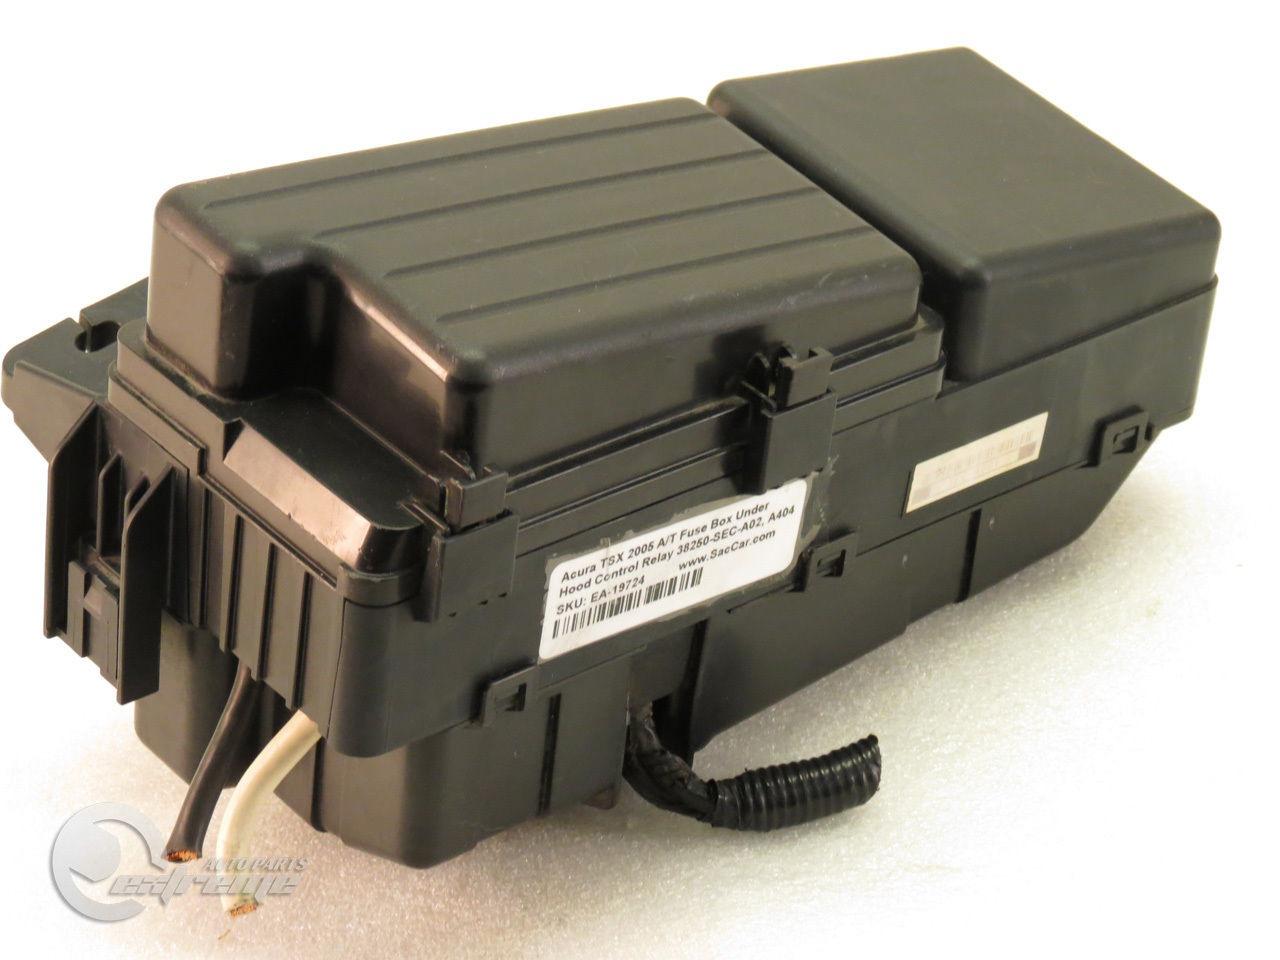 ... Acura TSX 2005 A/T Fuse Box Under Hood Control Relay 38250-SEC-